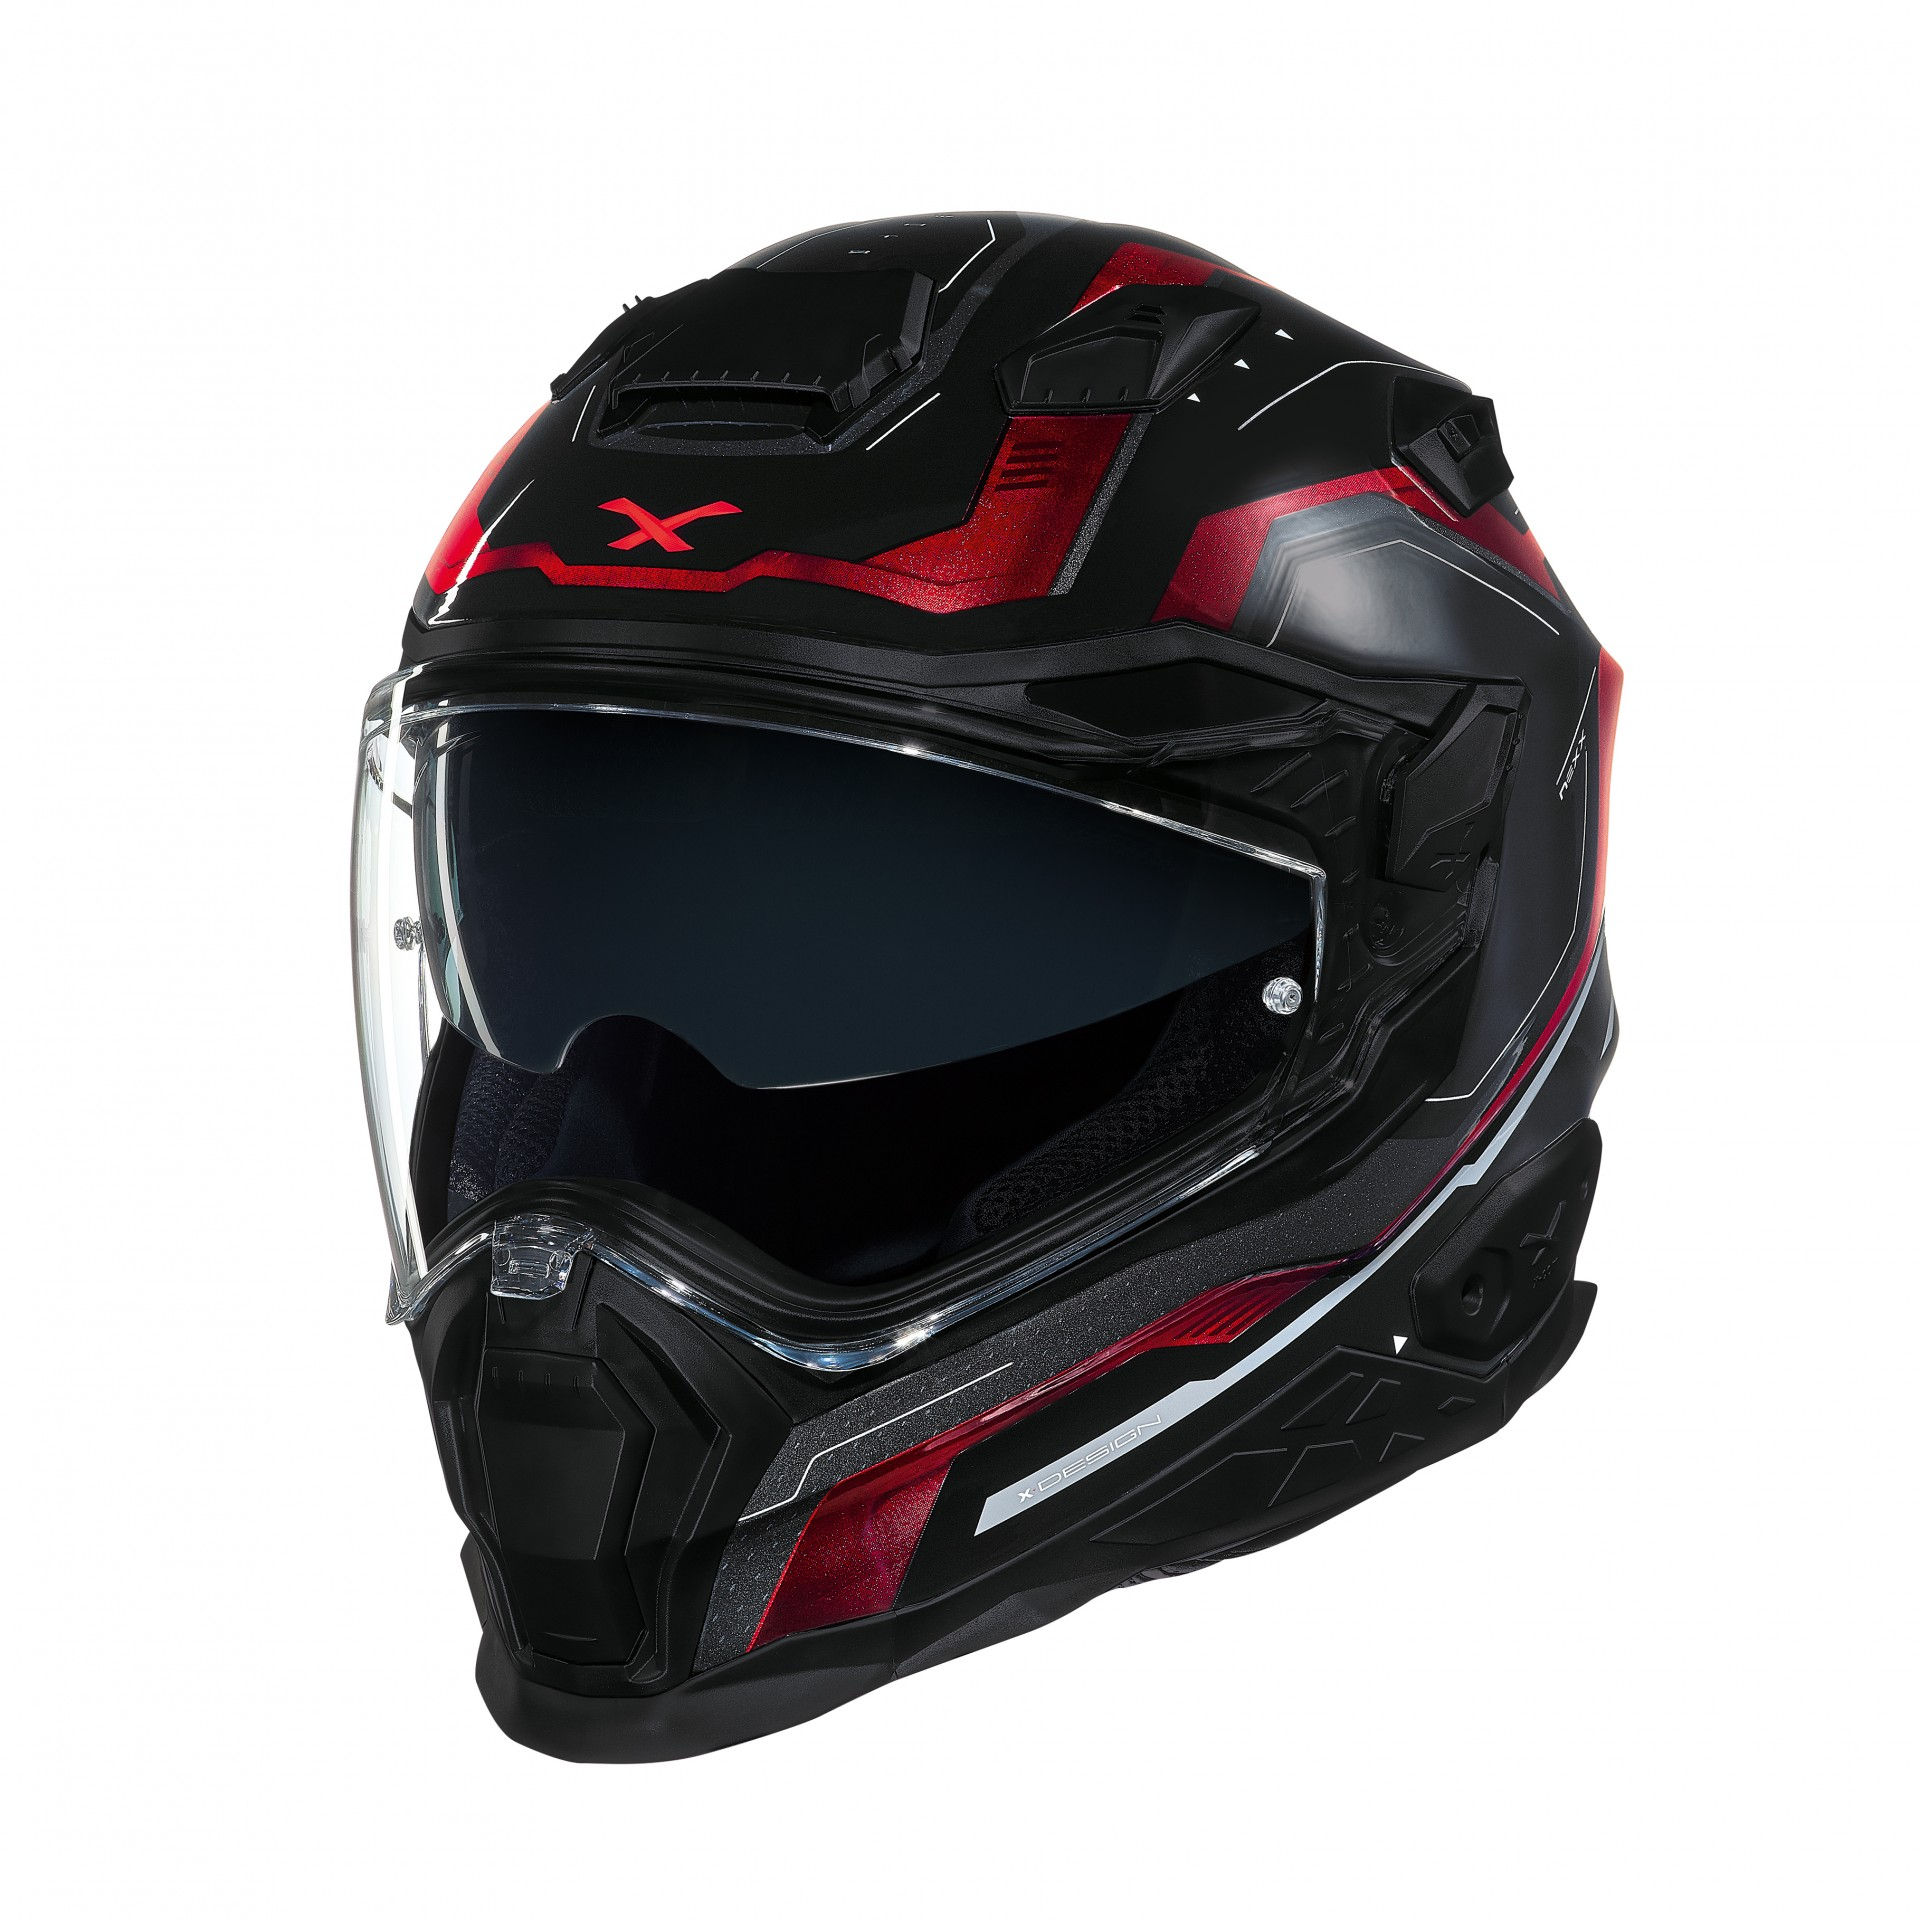 Capacete Nexx X.WST-2 Supercell Preto/Vermelho